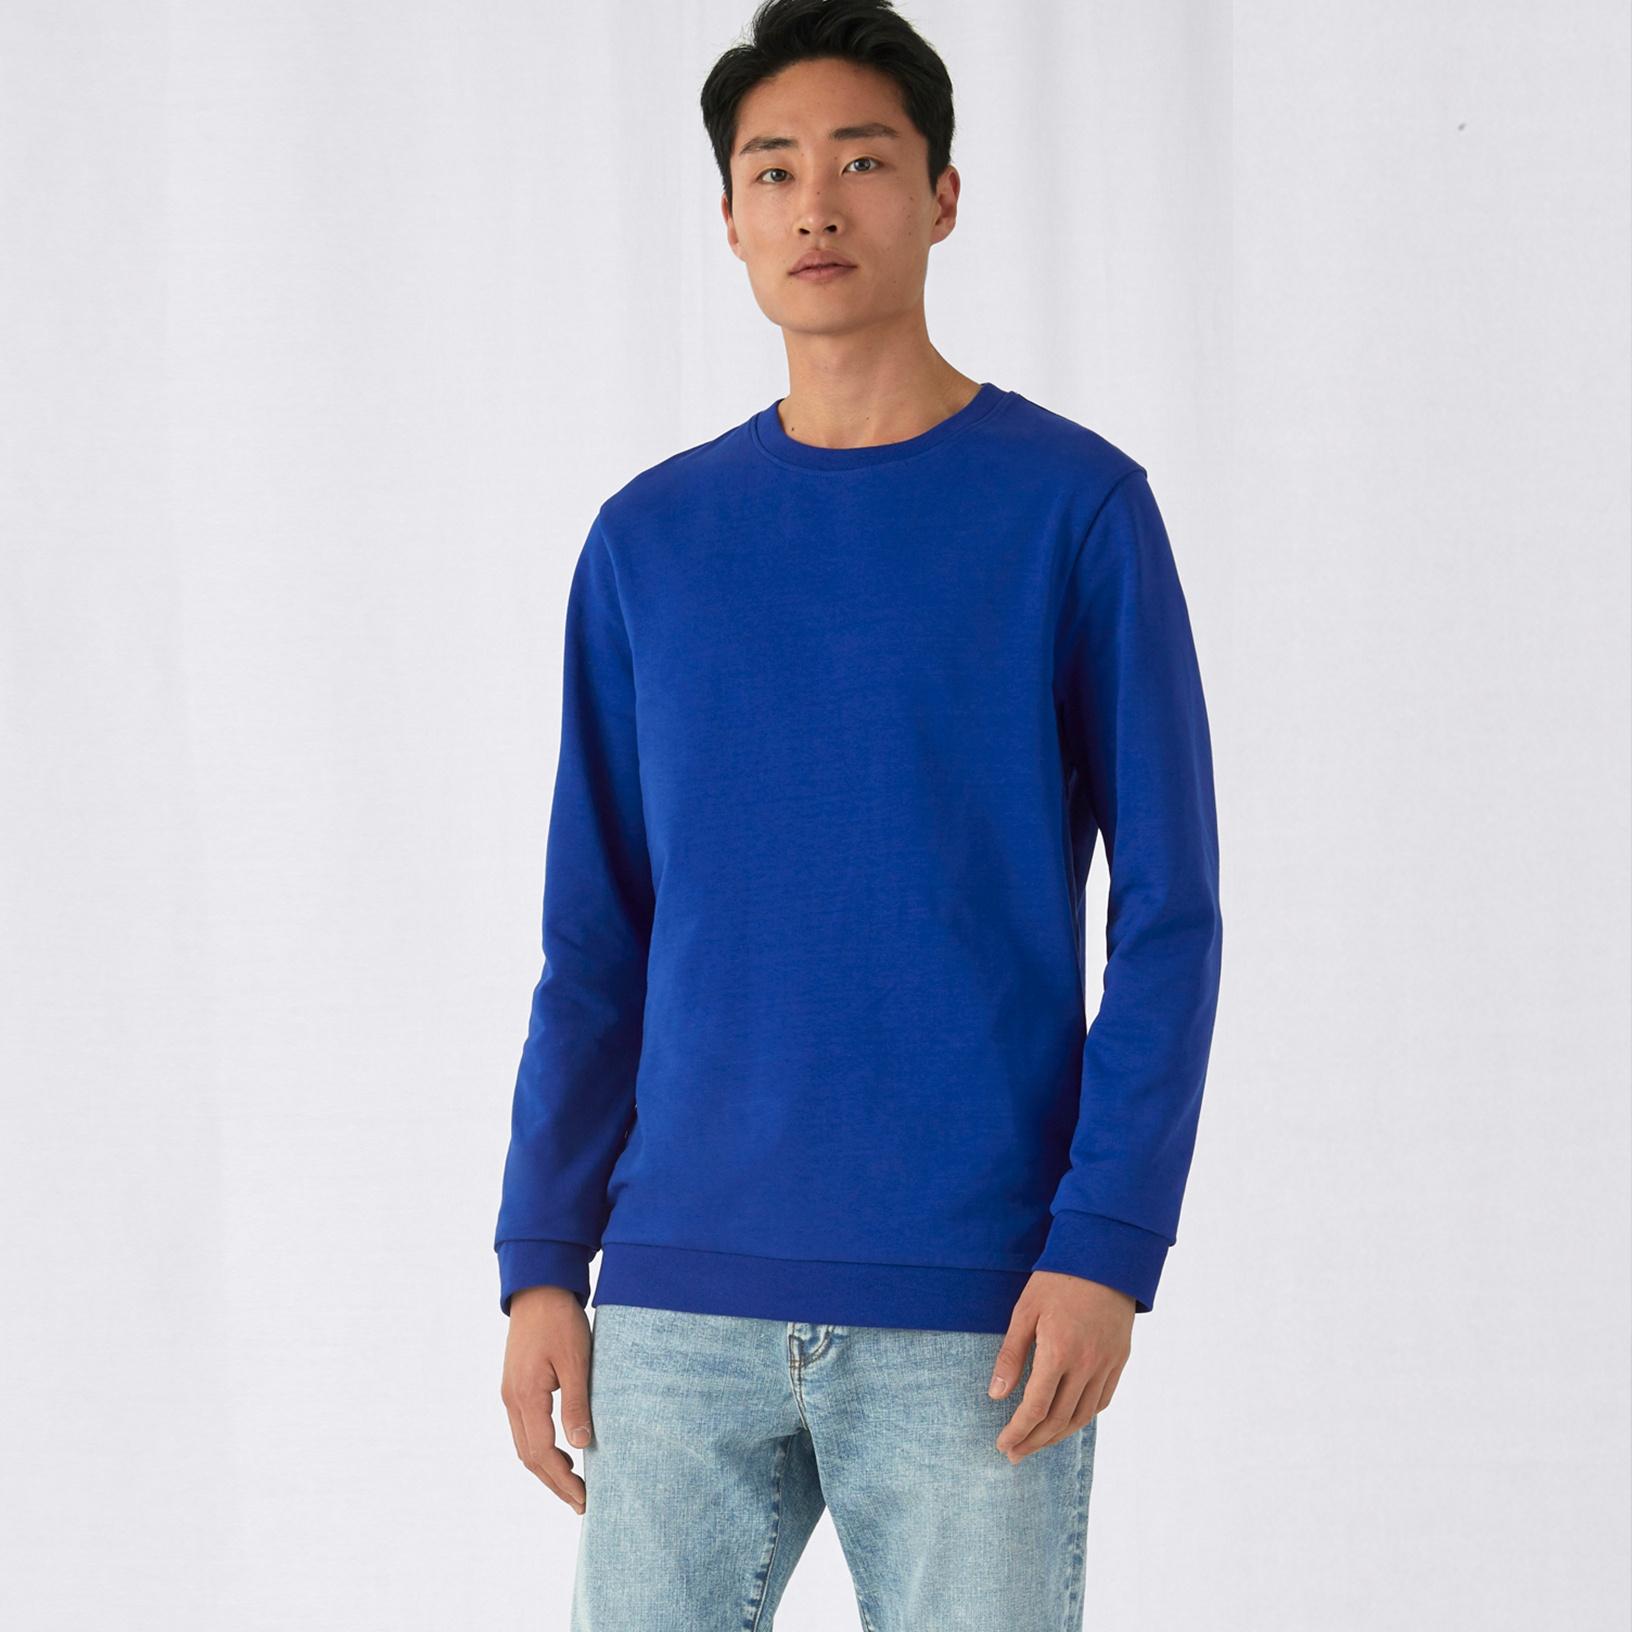 B/&C Collection Fashion Set-In Sweatshirt